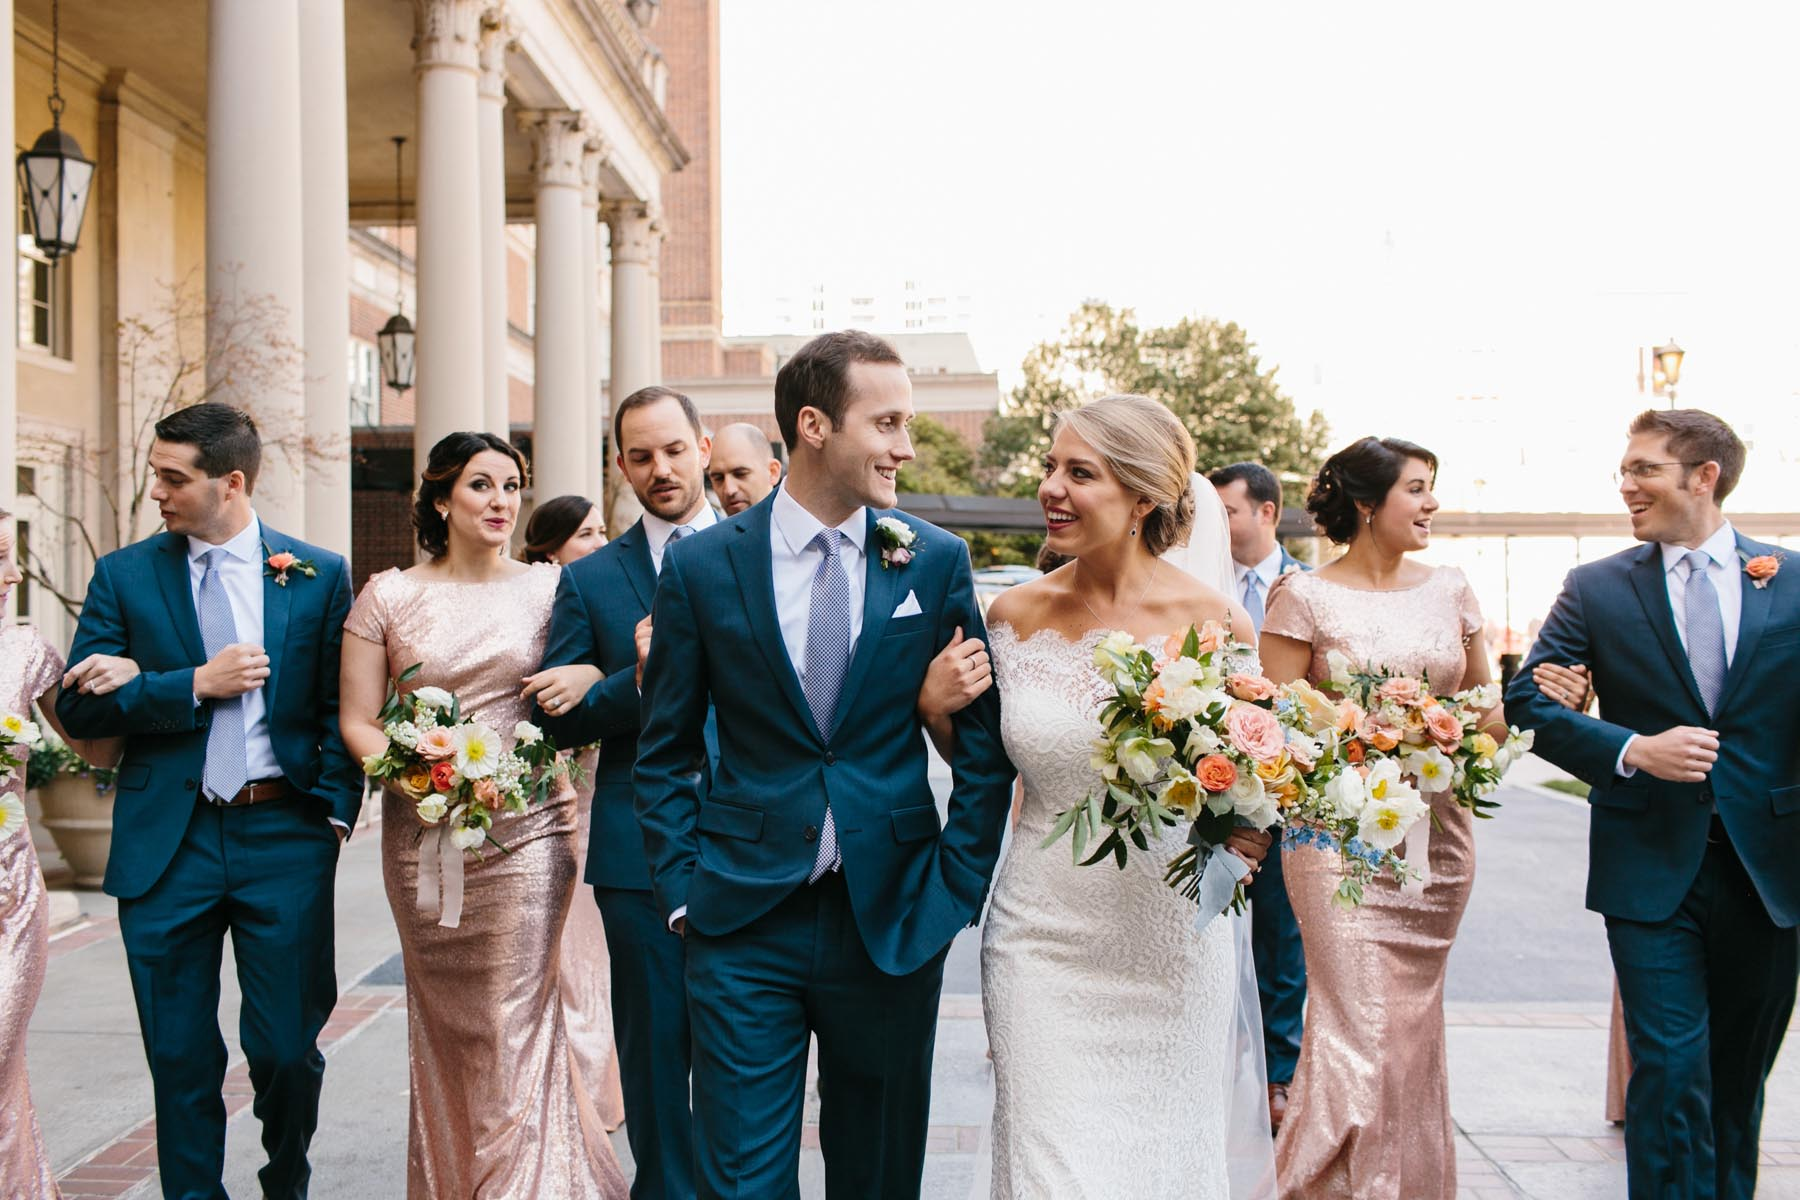 kjellman wedding blog biltmore wedding -56